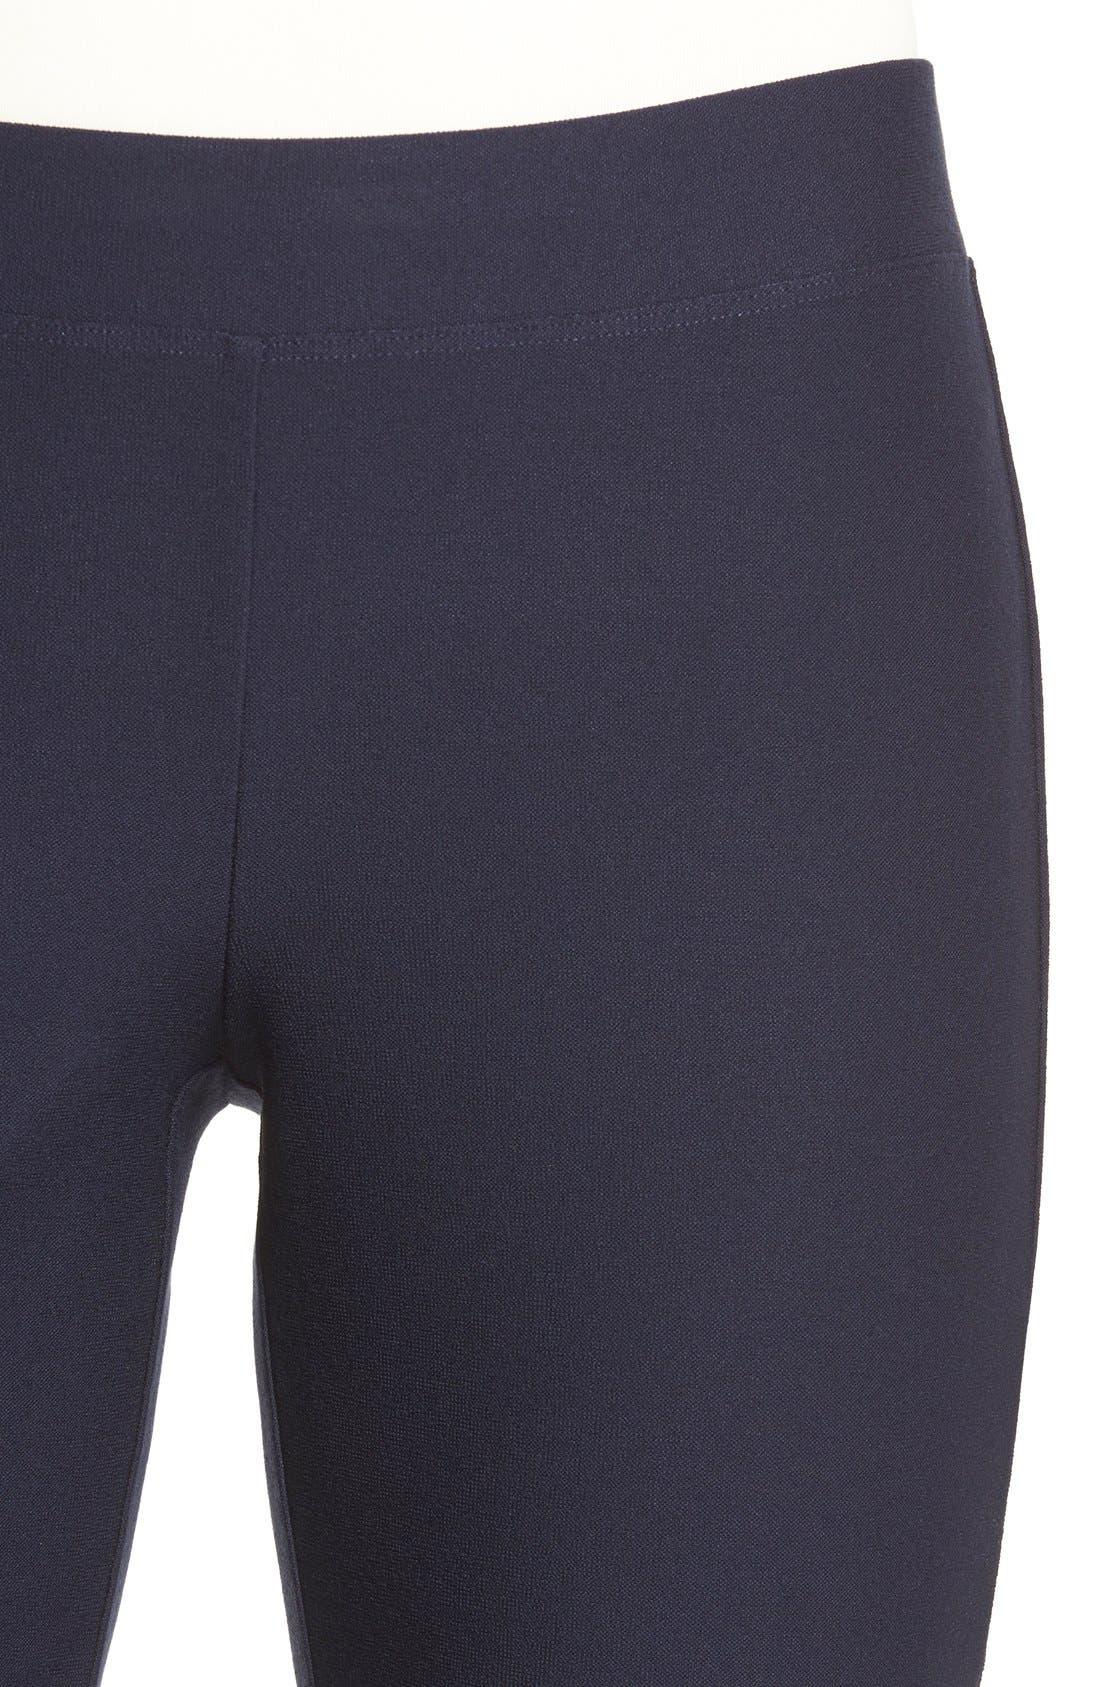 Stretch Crepe Slim Ankle Pants,                             Alternate thumbnail 124, color,